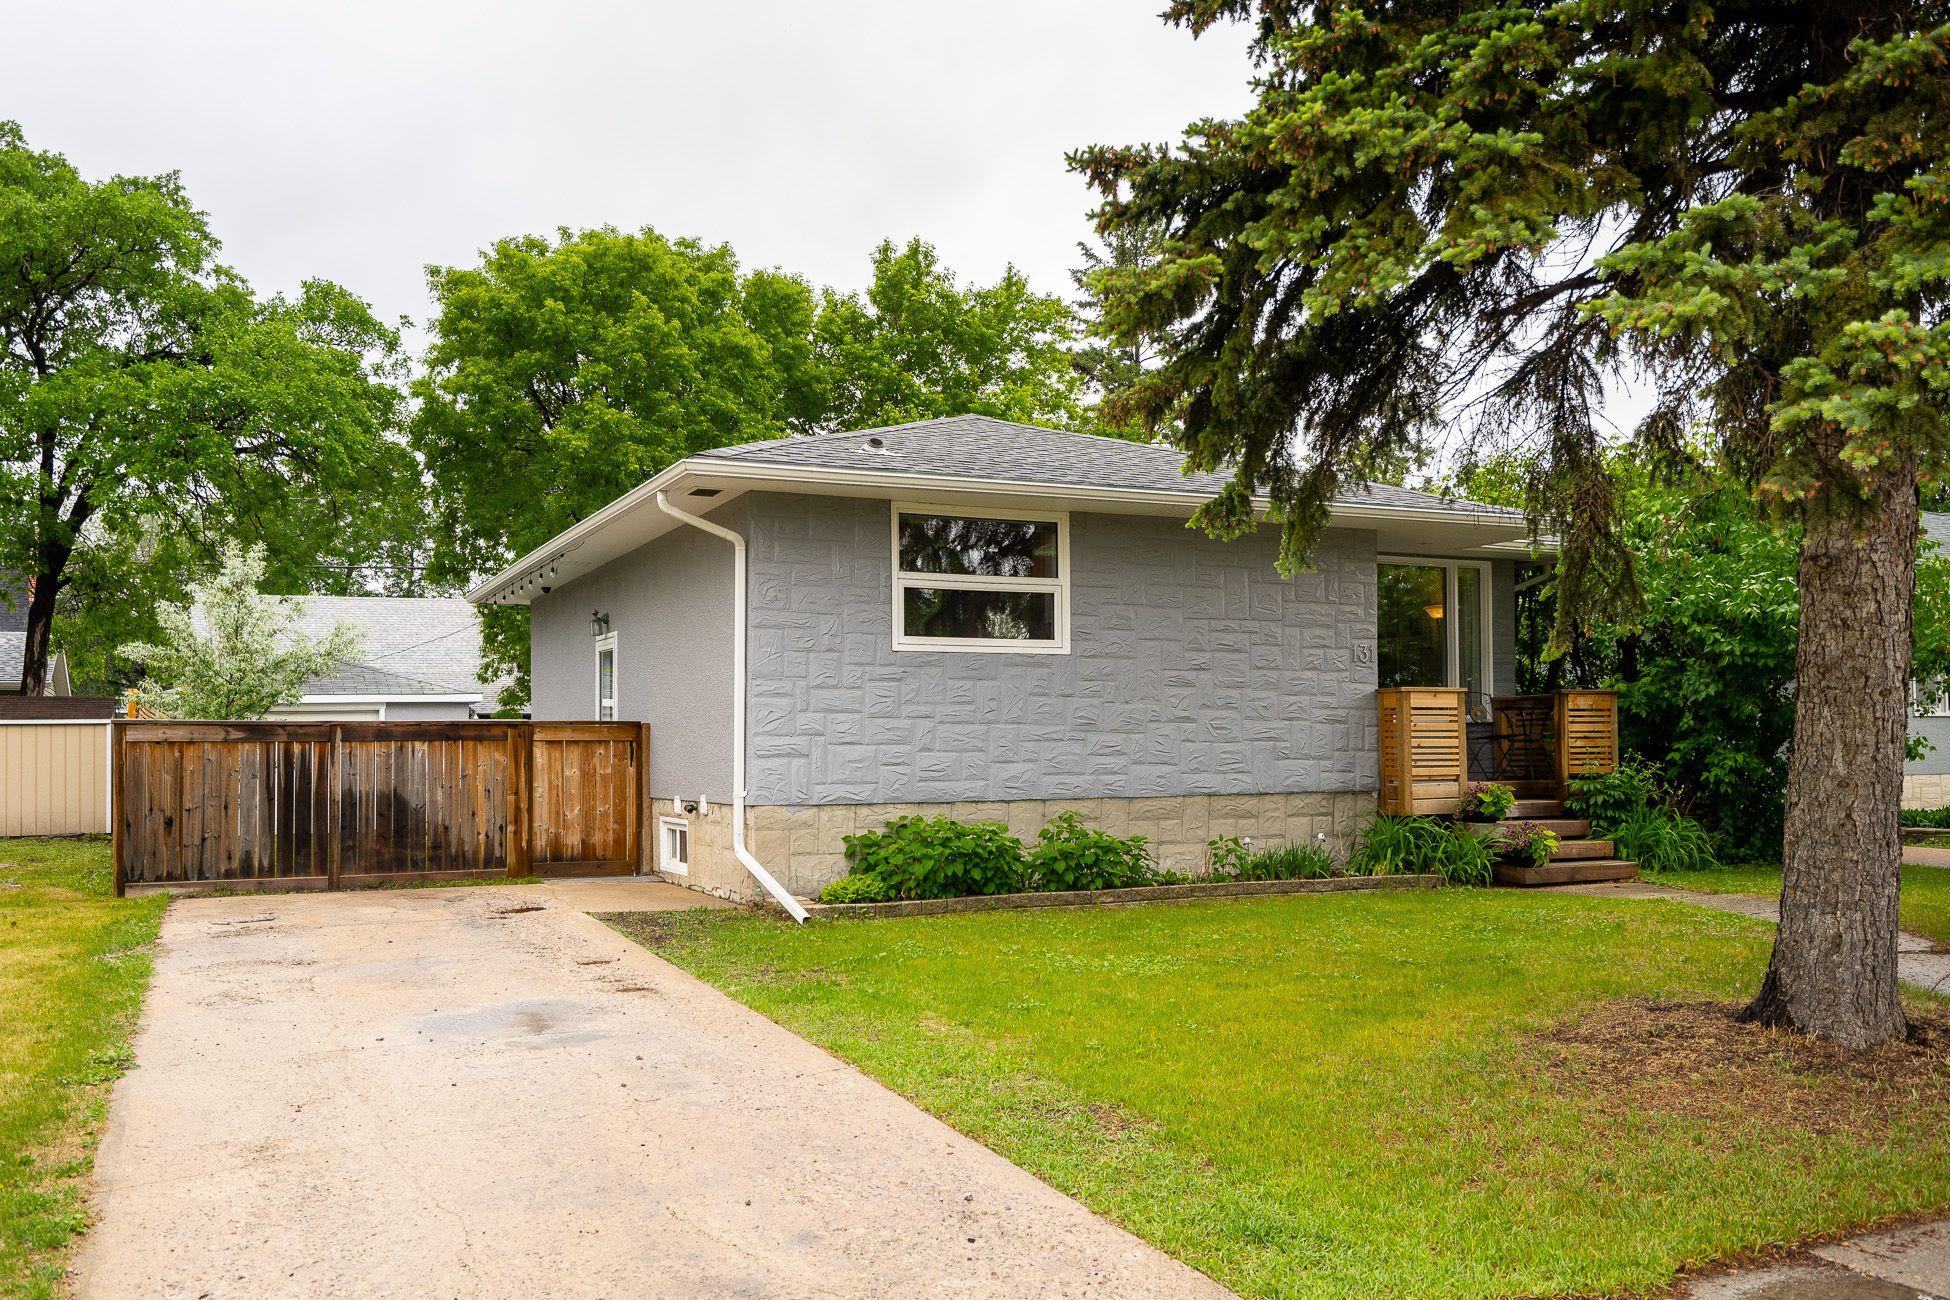 Main Photo: 131 Bank Avenue in Winnipeg: St Vital House for sale (2D)  : MLS®# 202114506